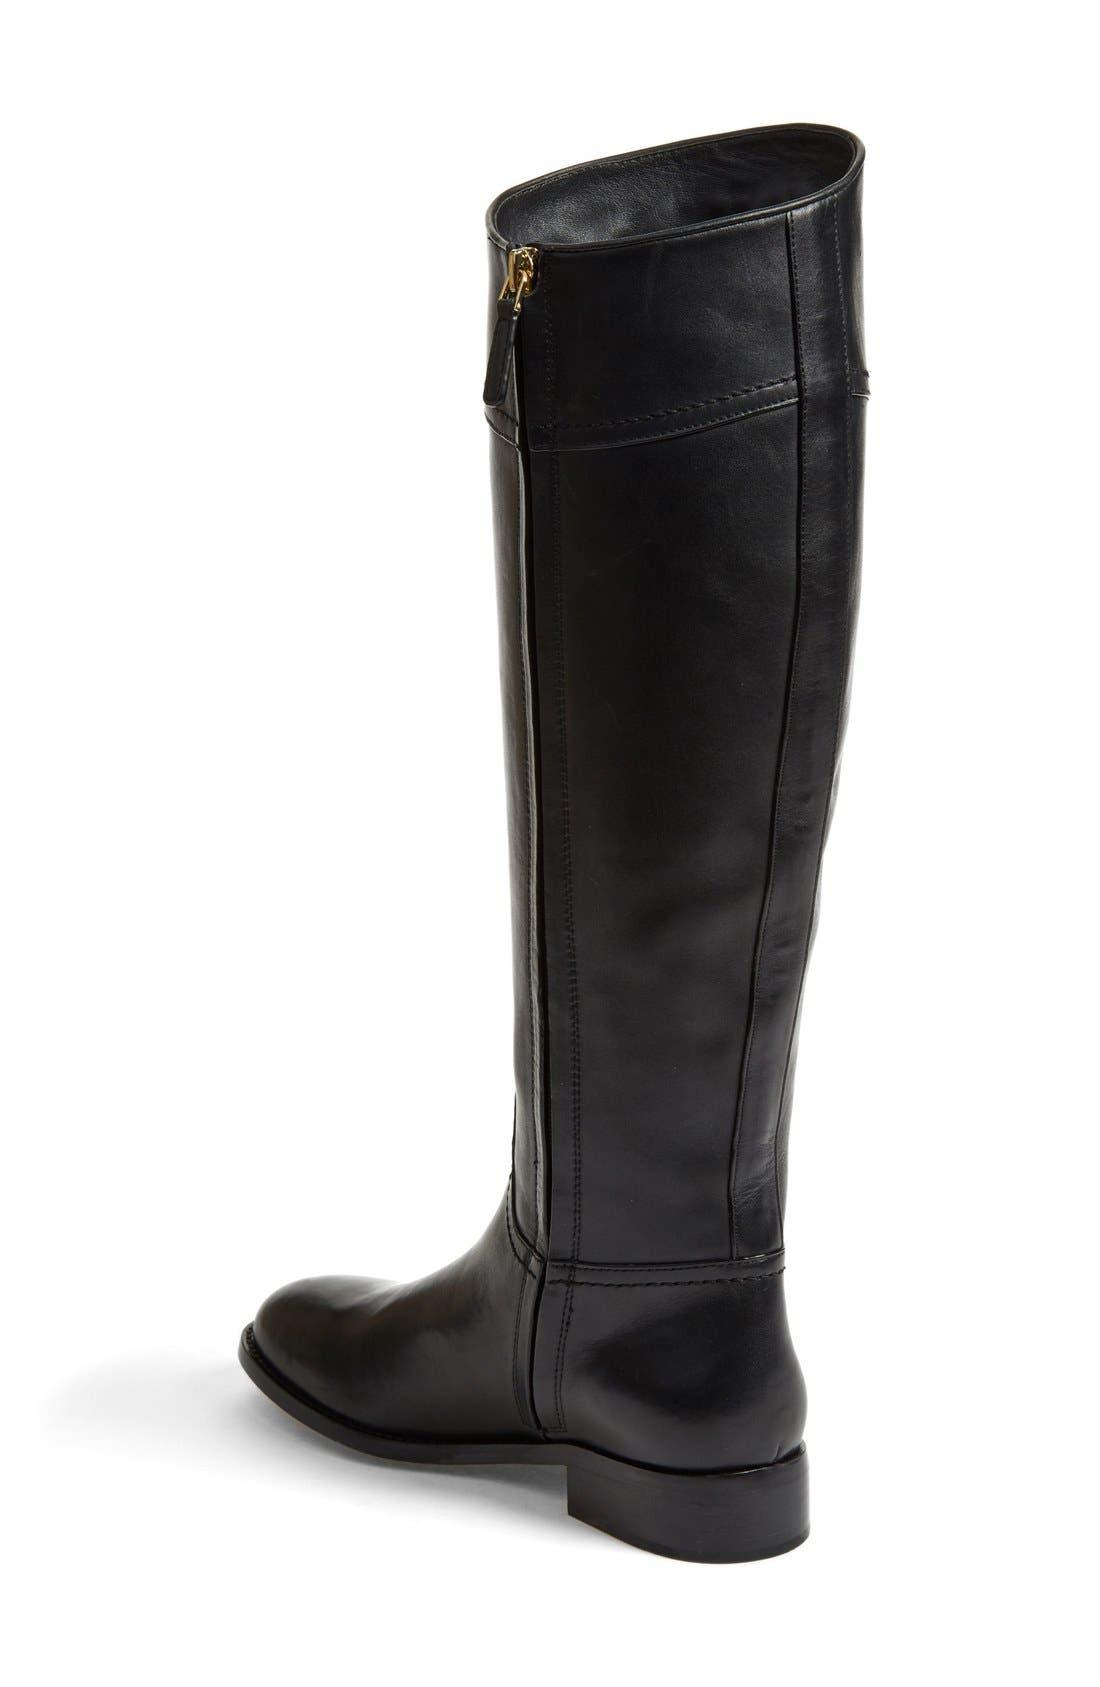 Alternate Image 2  - Tory Burch 'Ashlynn' Wide Calf Riding Boot (Women)